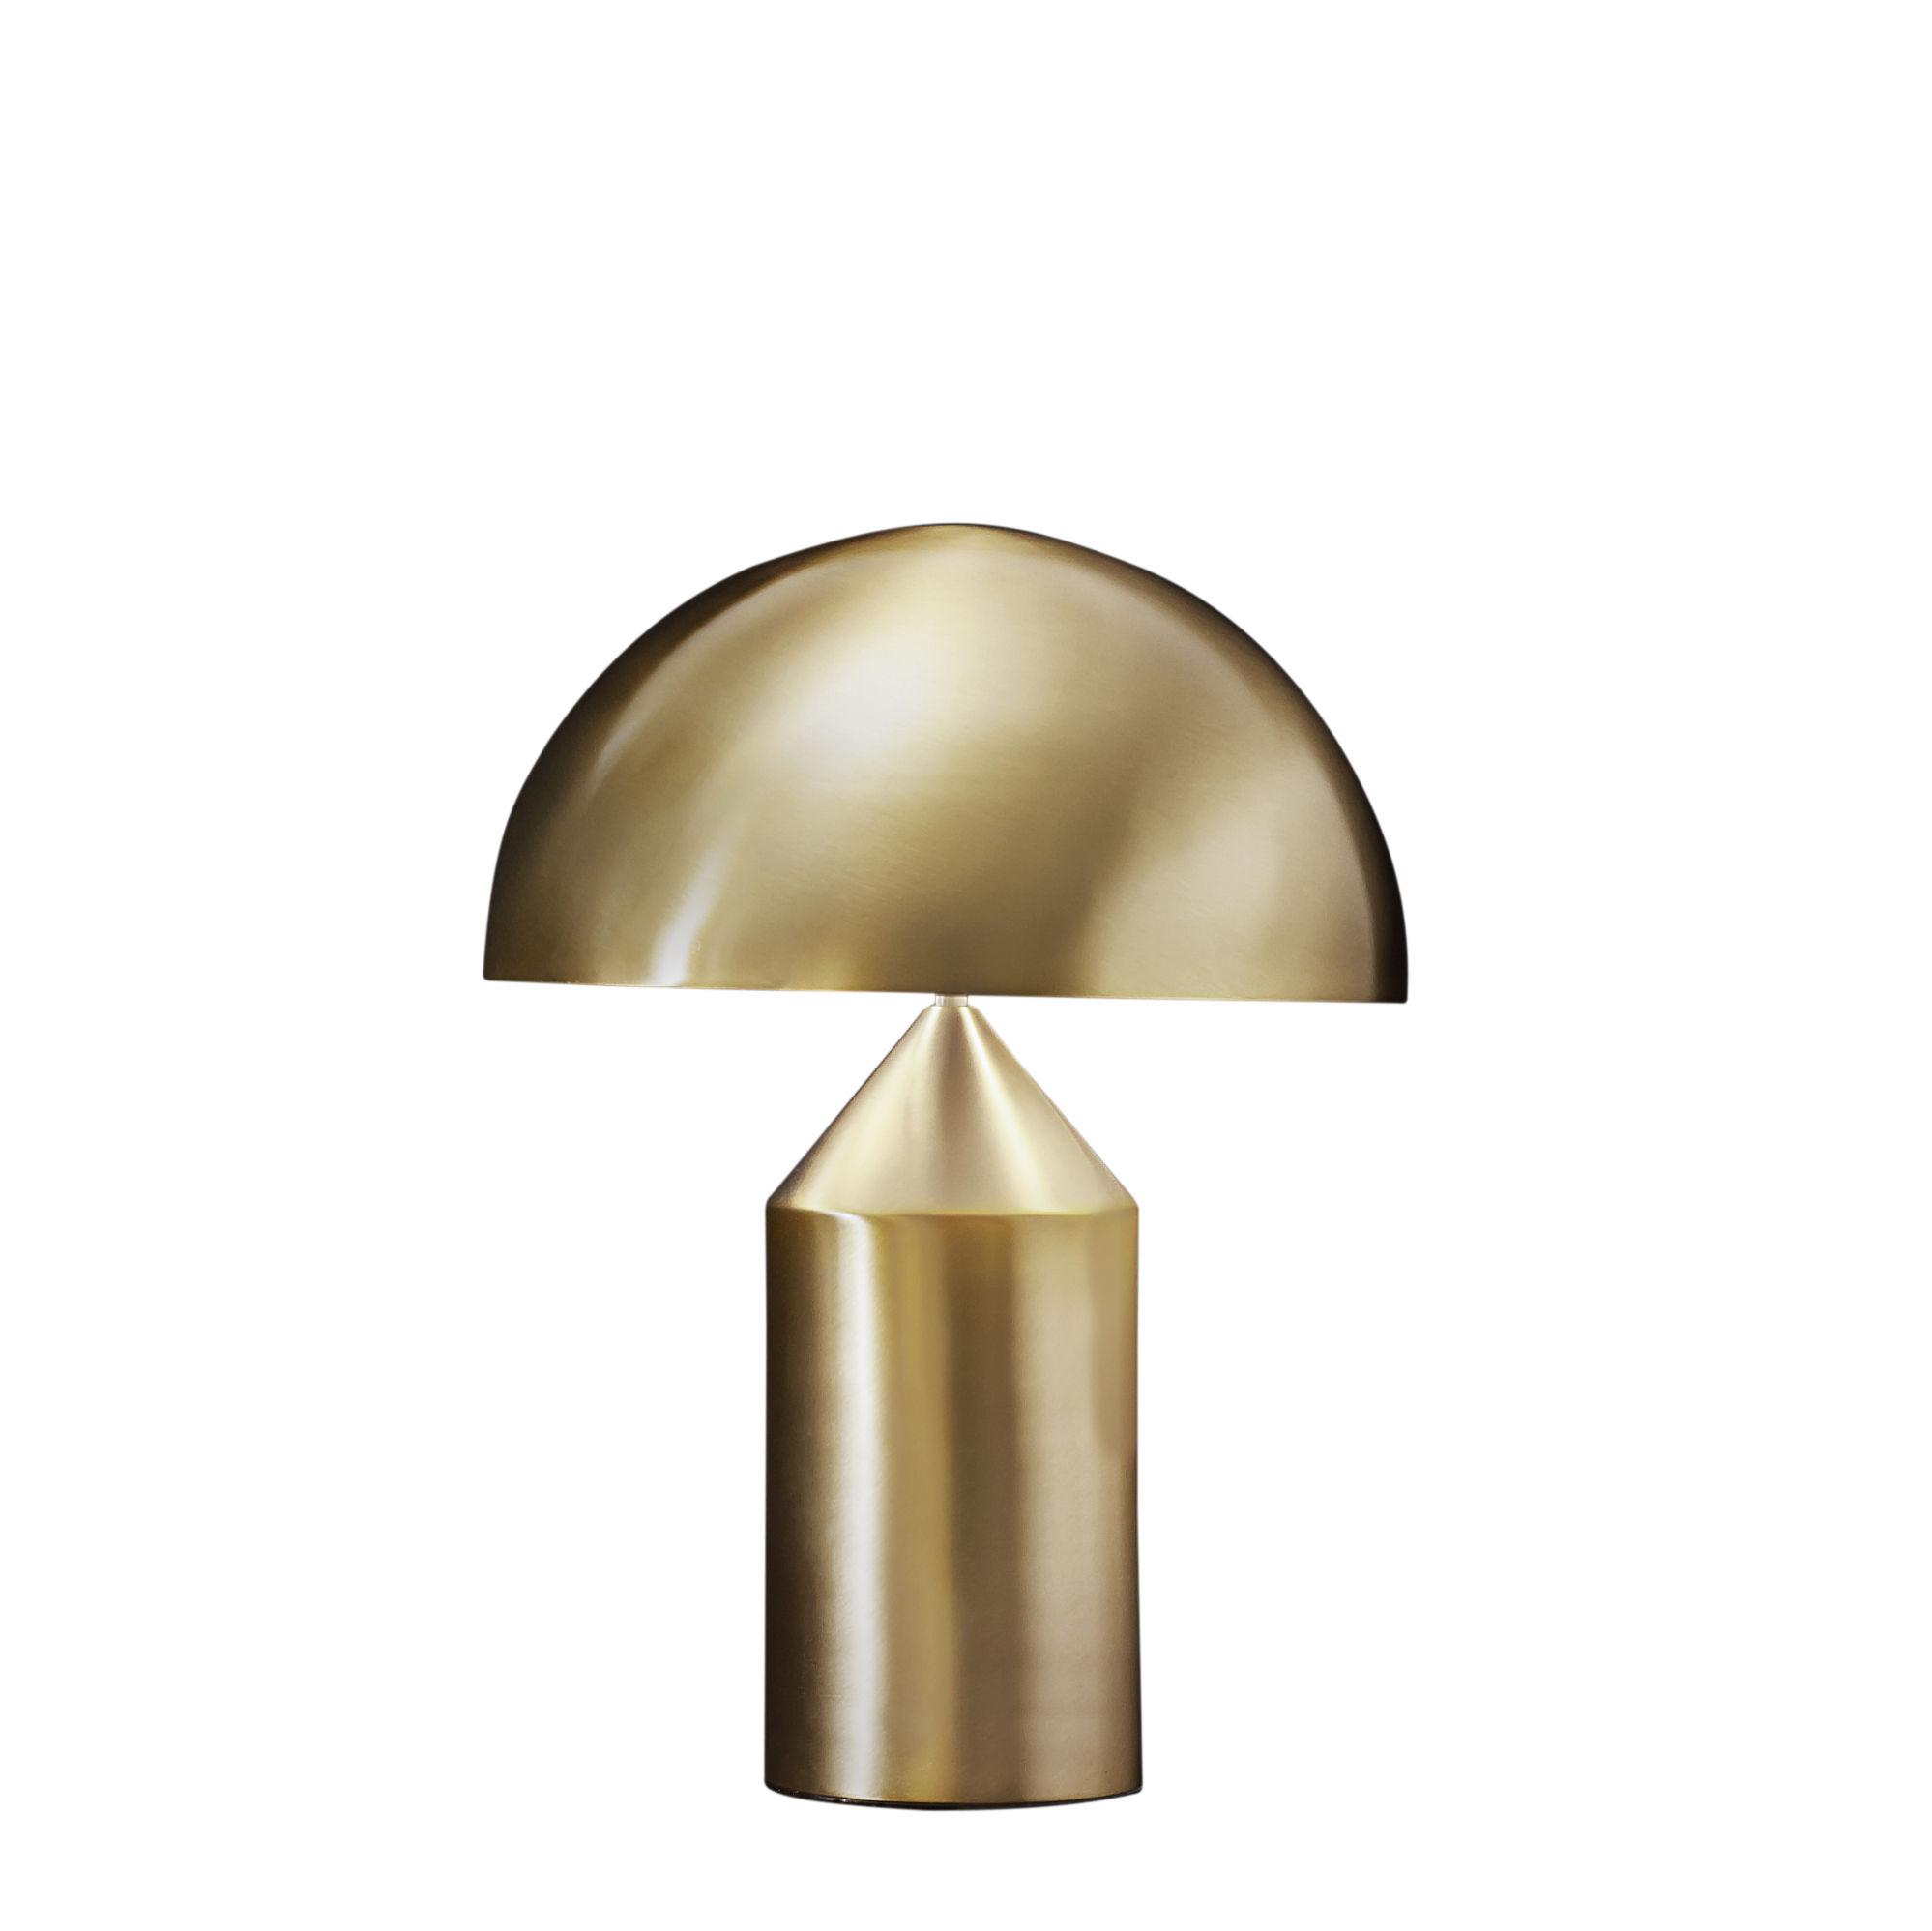 Alle Designer - Atollo Medium Tischleuchte Métal / H 50 cm / Vico Magistretti, 1977 - O luce - Gold - klarlackbeschichtetes Aluminium